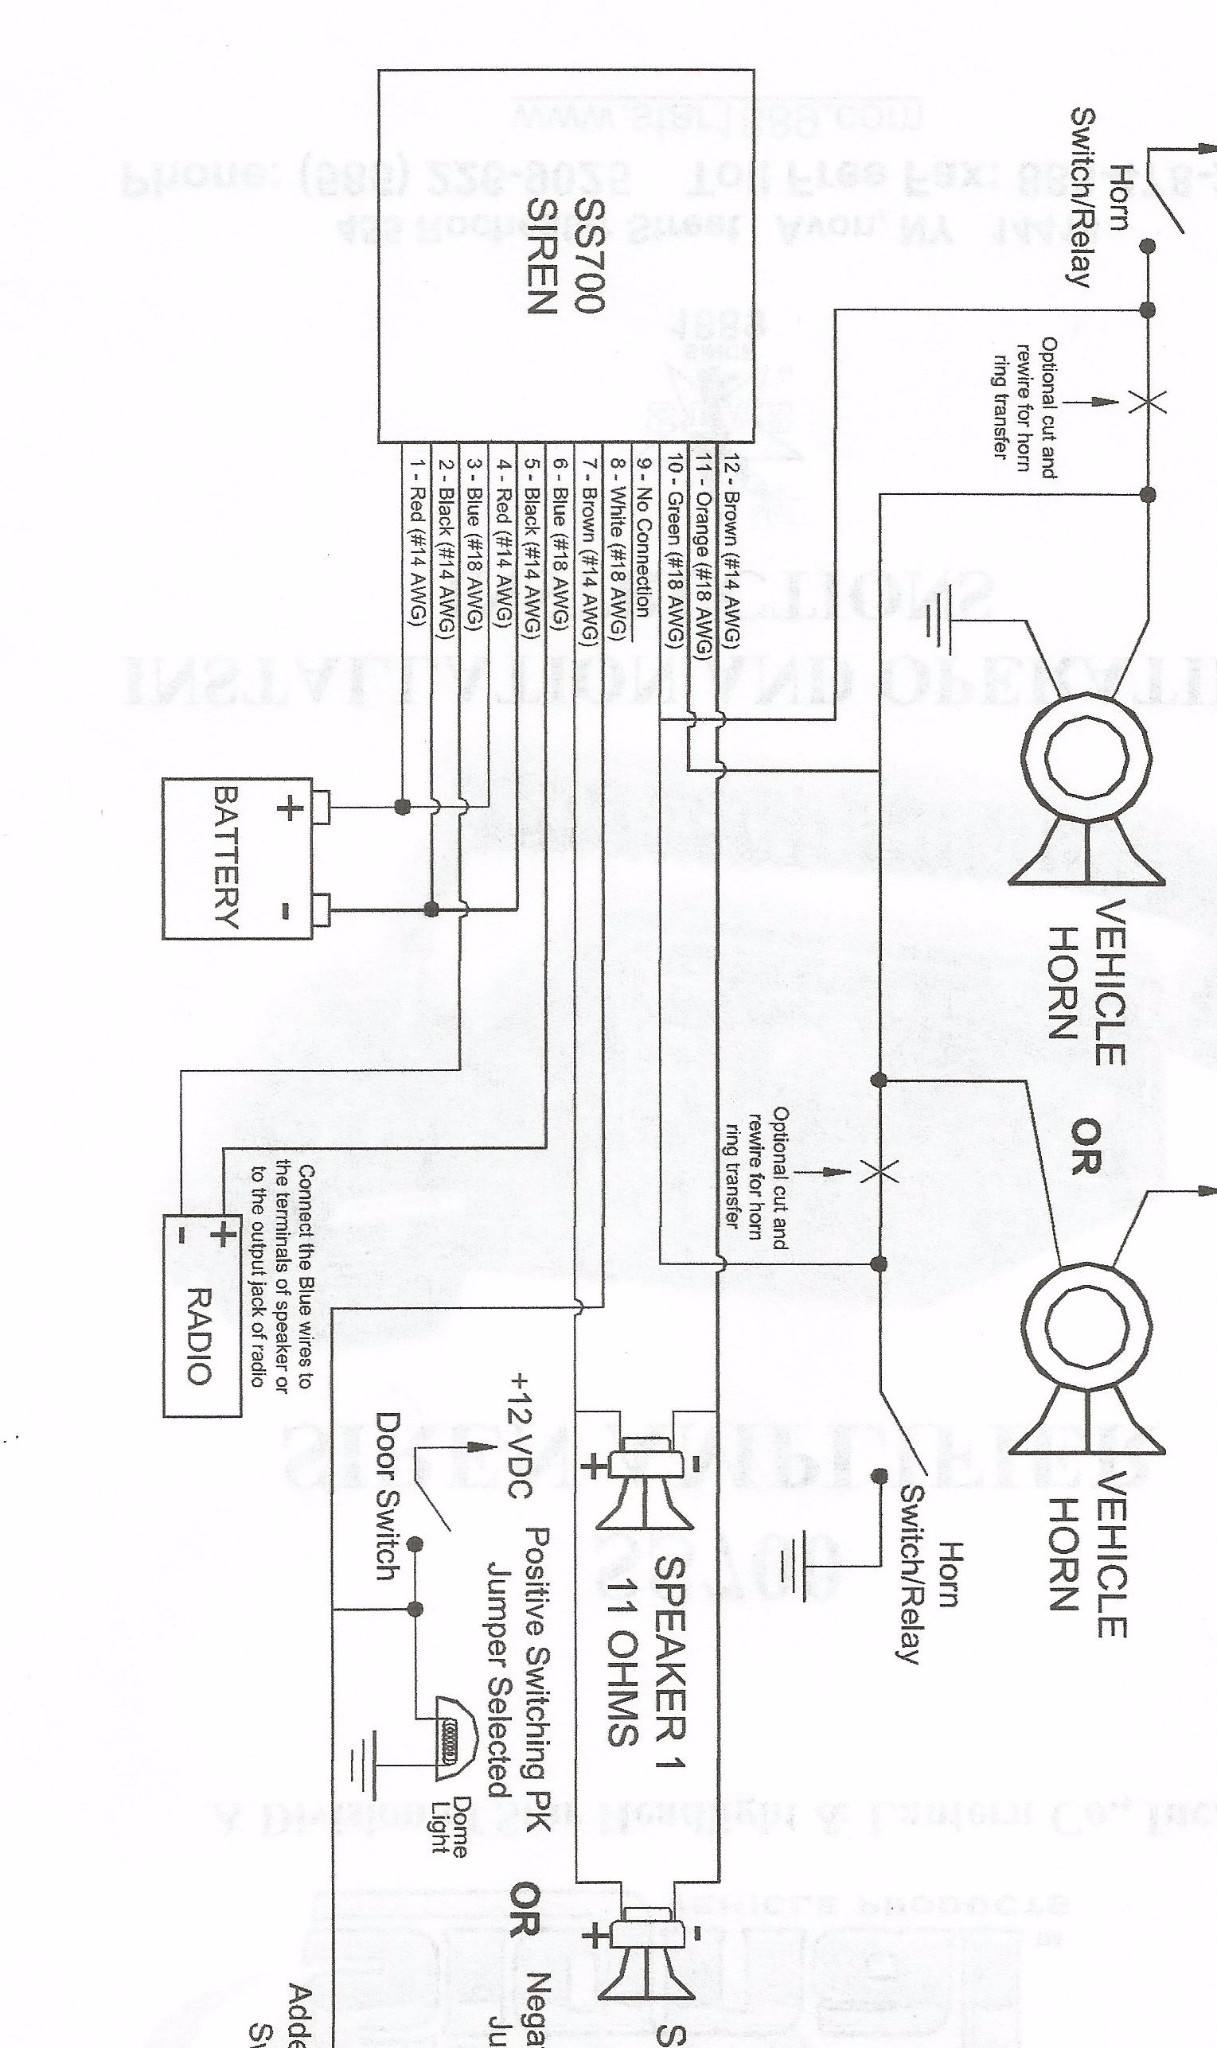 Signal Vehicle Products Siren Wiring Diagram Online Schematic Wiring  Speakers In Series Siren Speakers Wiring Diagram For 2